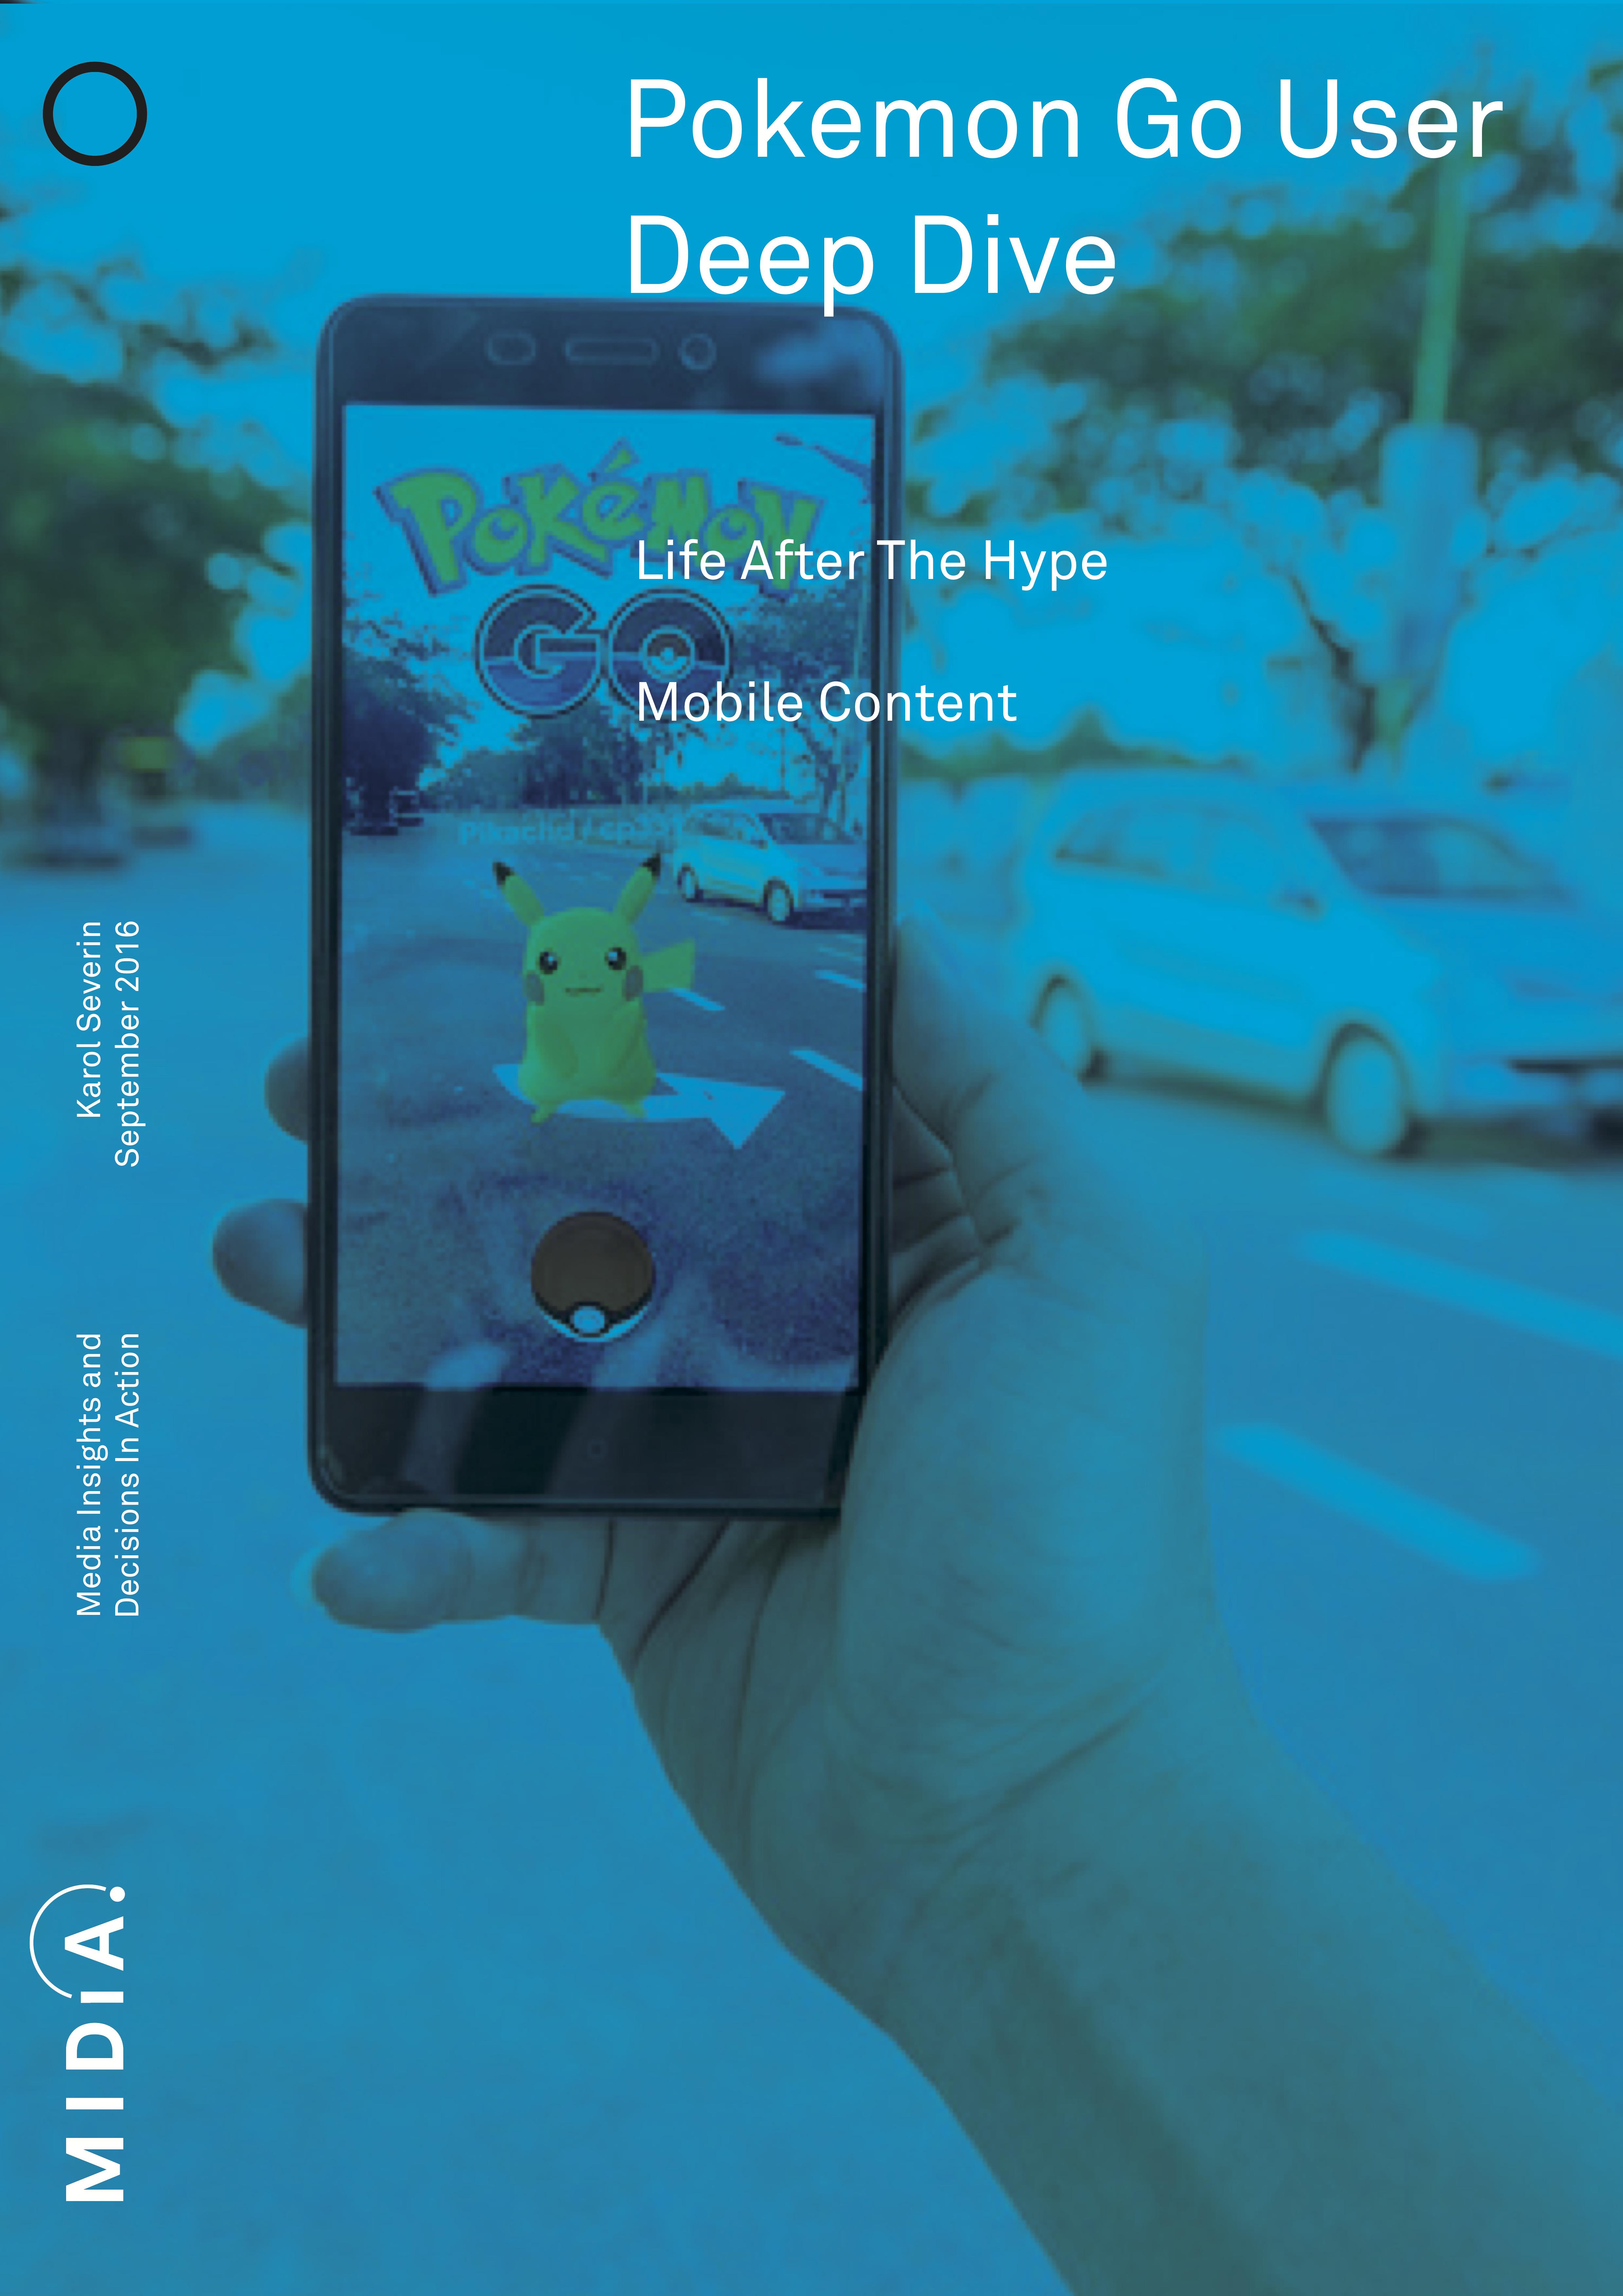 Cover image for Pokémon Go User Deep Dive